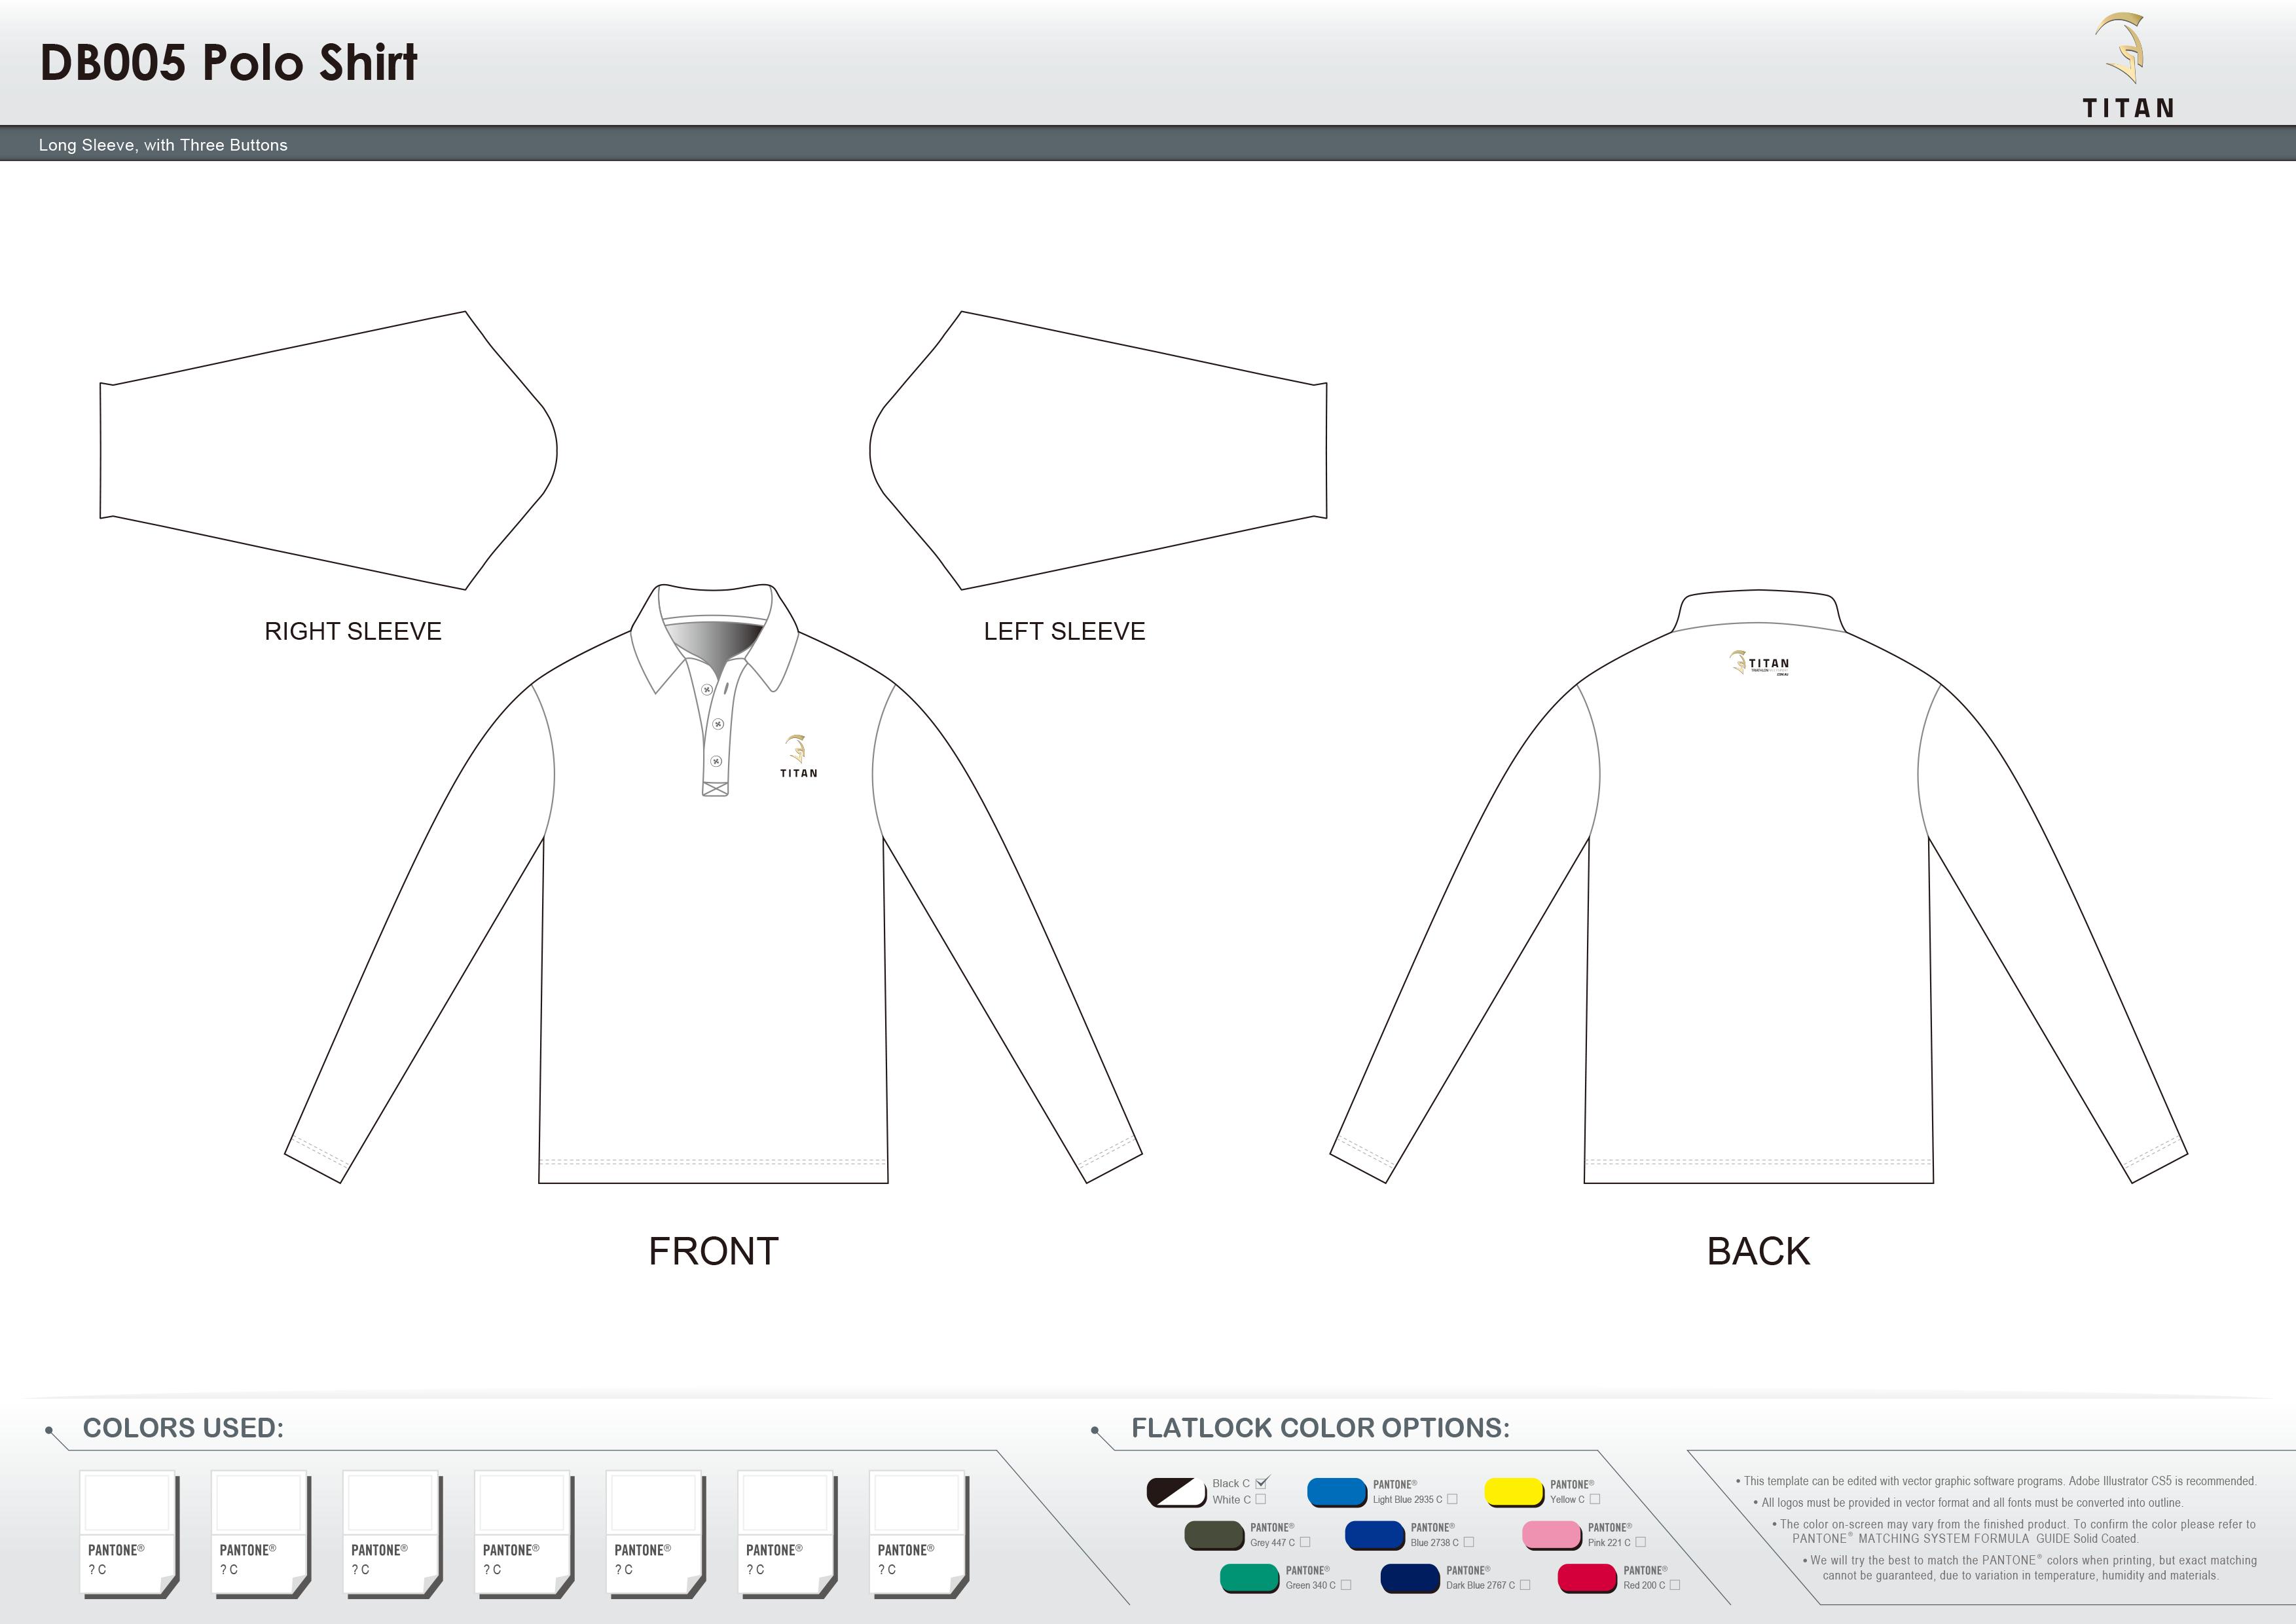 DB005 Polo Shirt